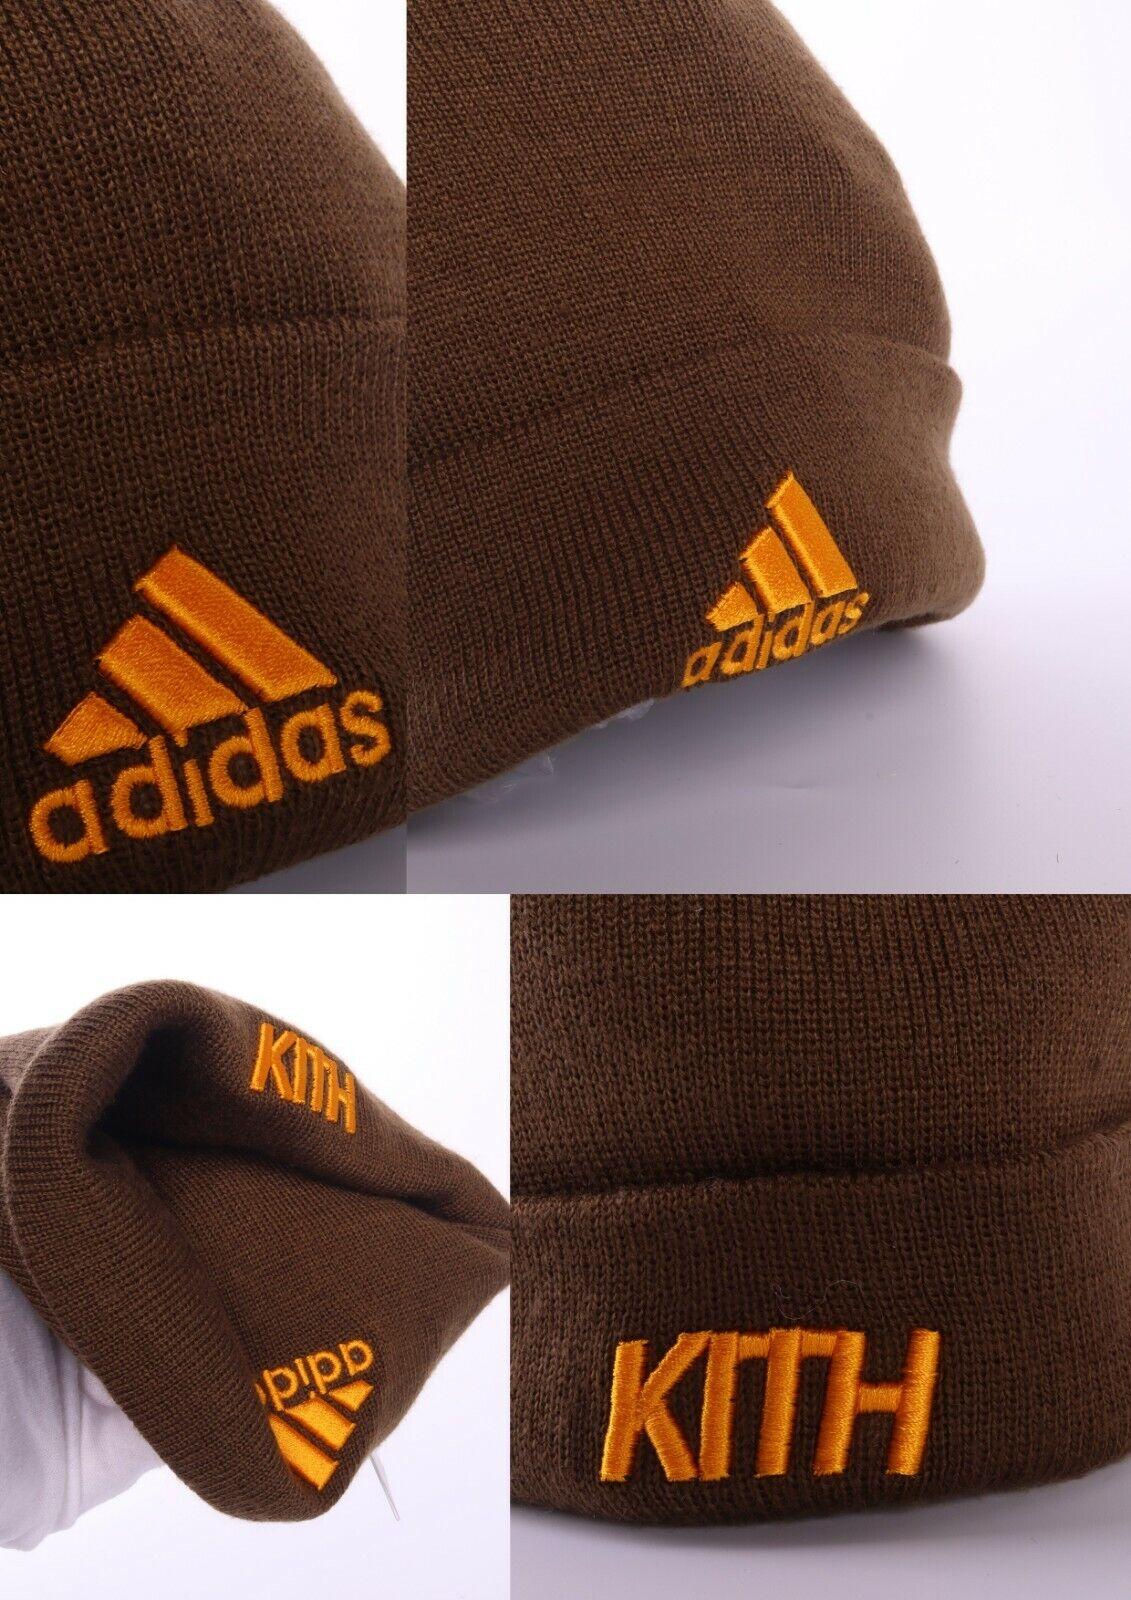 Adidas x Kith Dunkel Olive 100% Acryl K Wollie Beanie Mütze Einheitsgröße